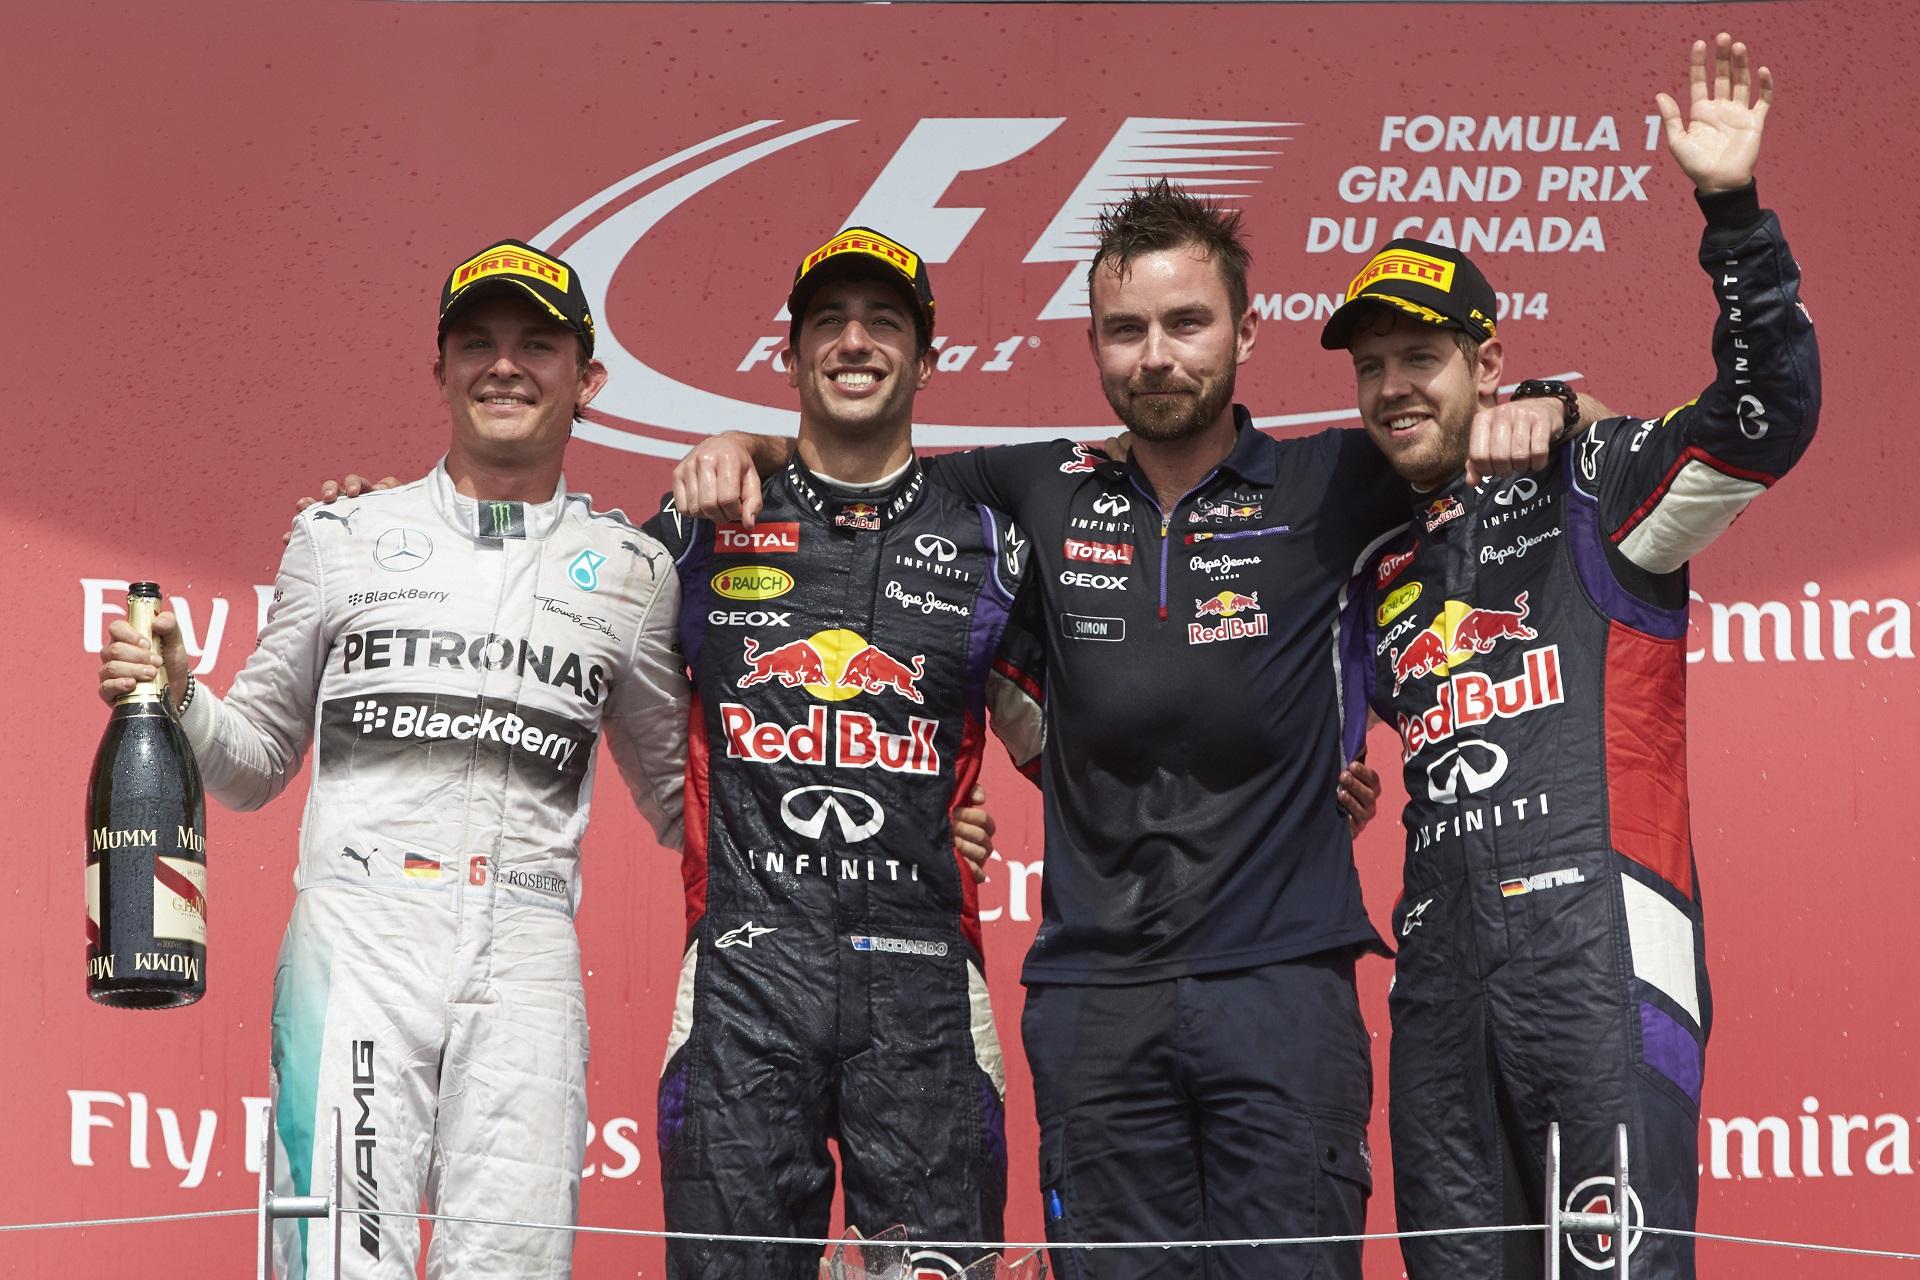 Canada Podium 2014 - Mercedes AMG Petronas Media.jpg